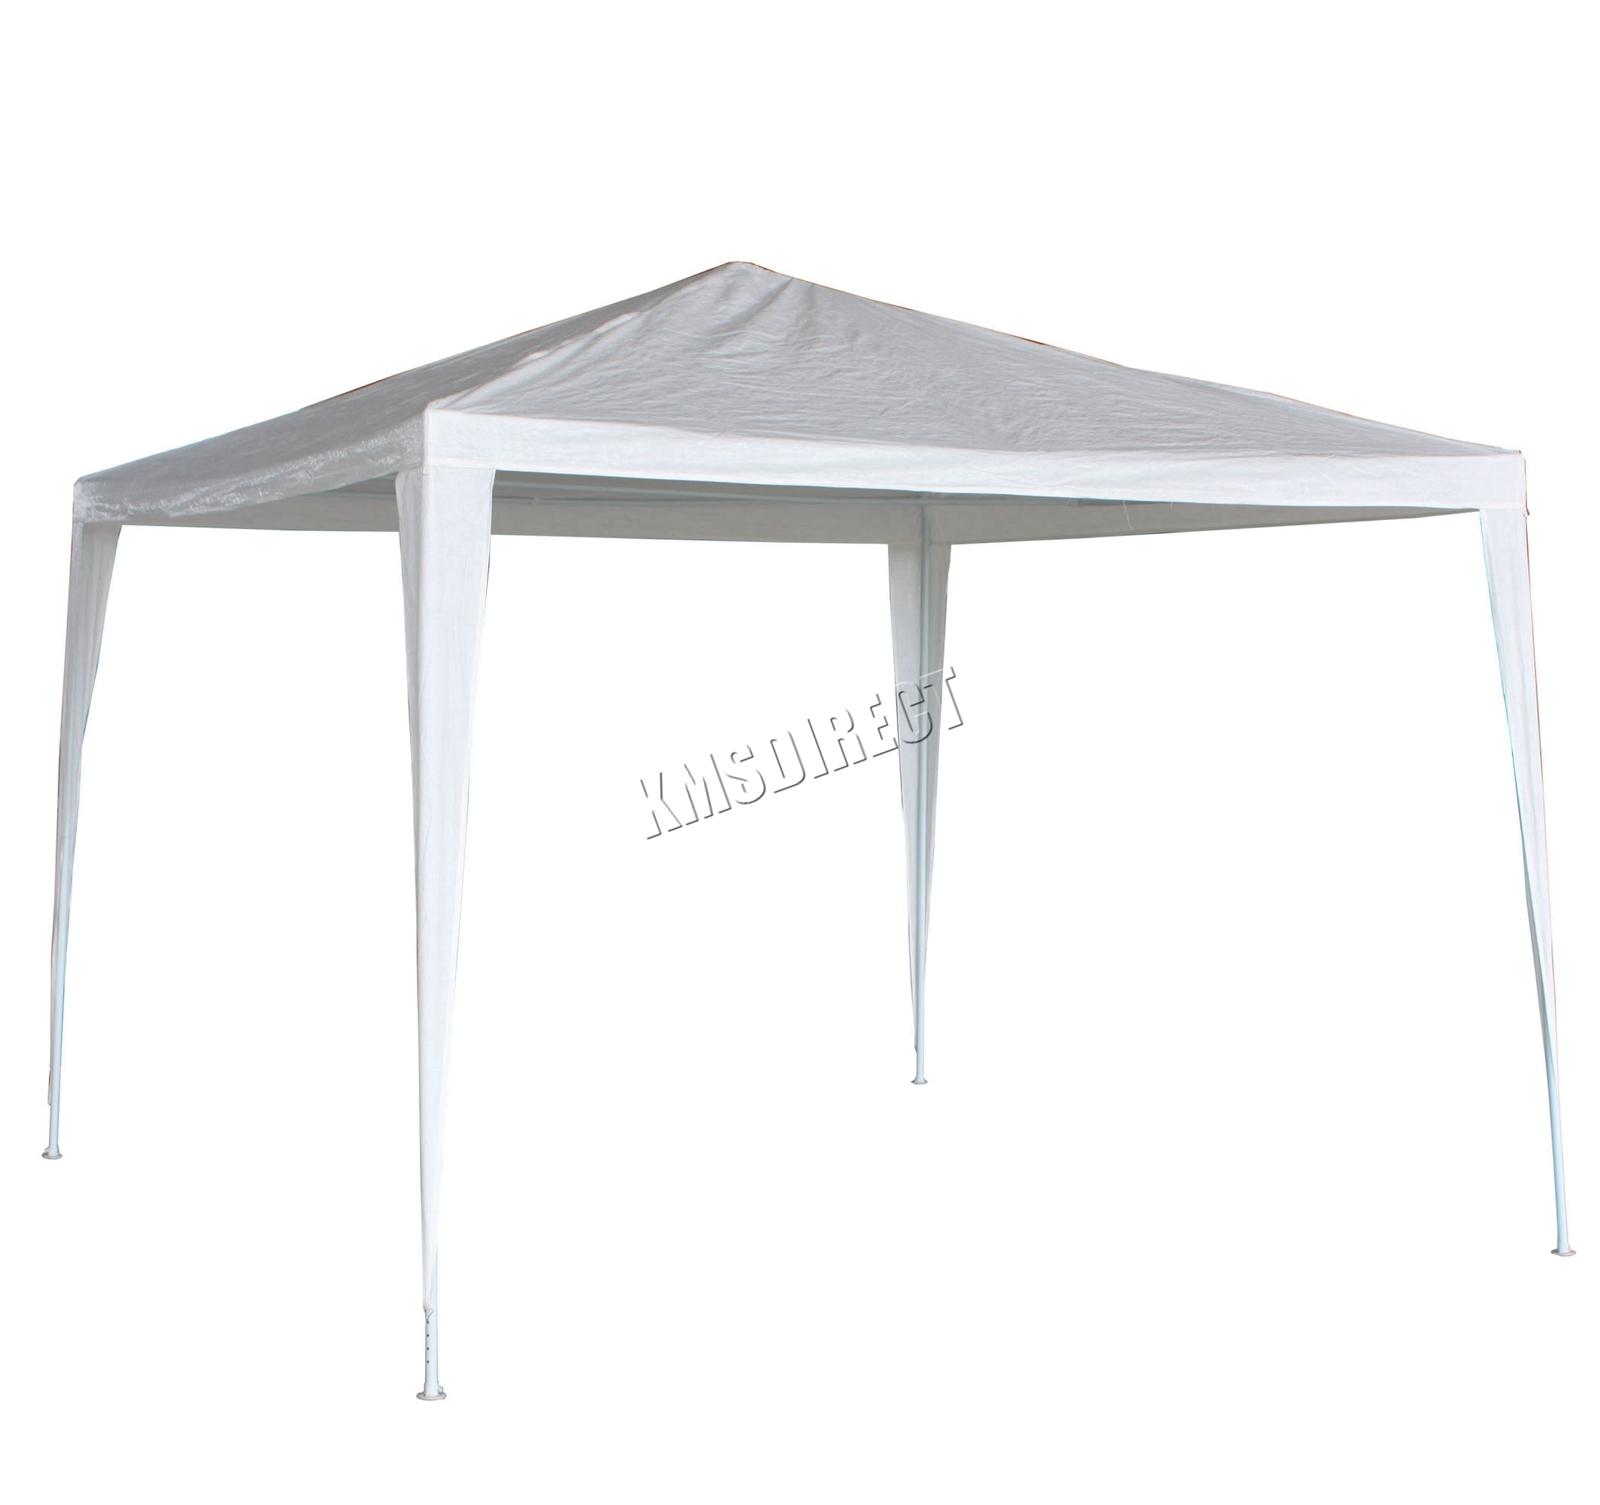 New-3-x-3m-120g-Waterproof-Outdoor-PE-Garden-Gazebo-Marquee-Canopy-Party-Tent Indexbild 33